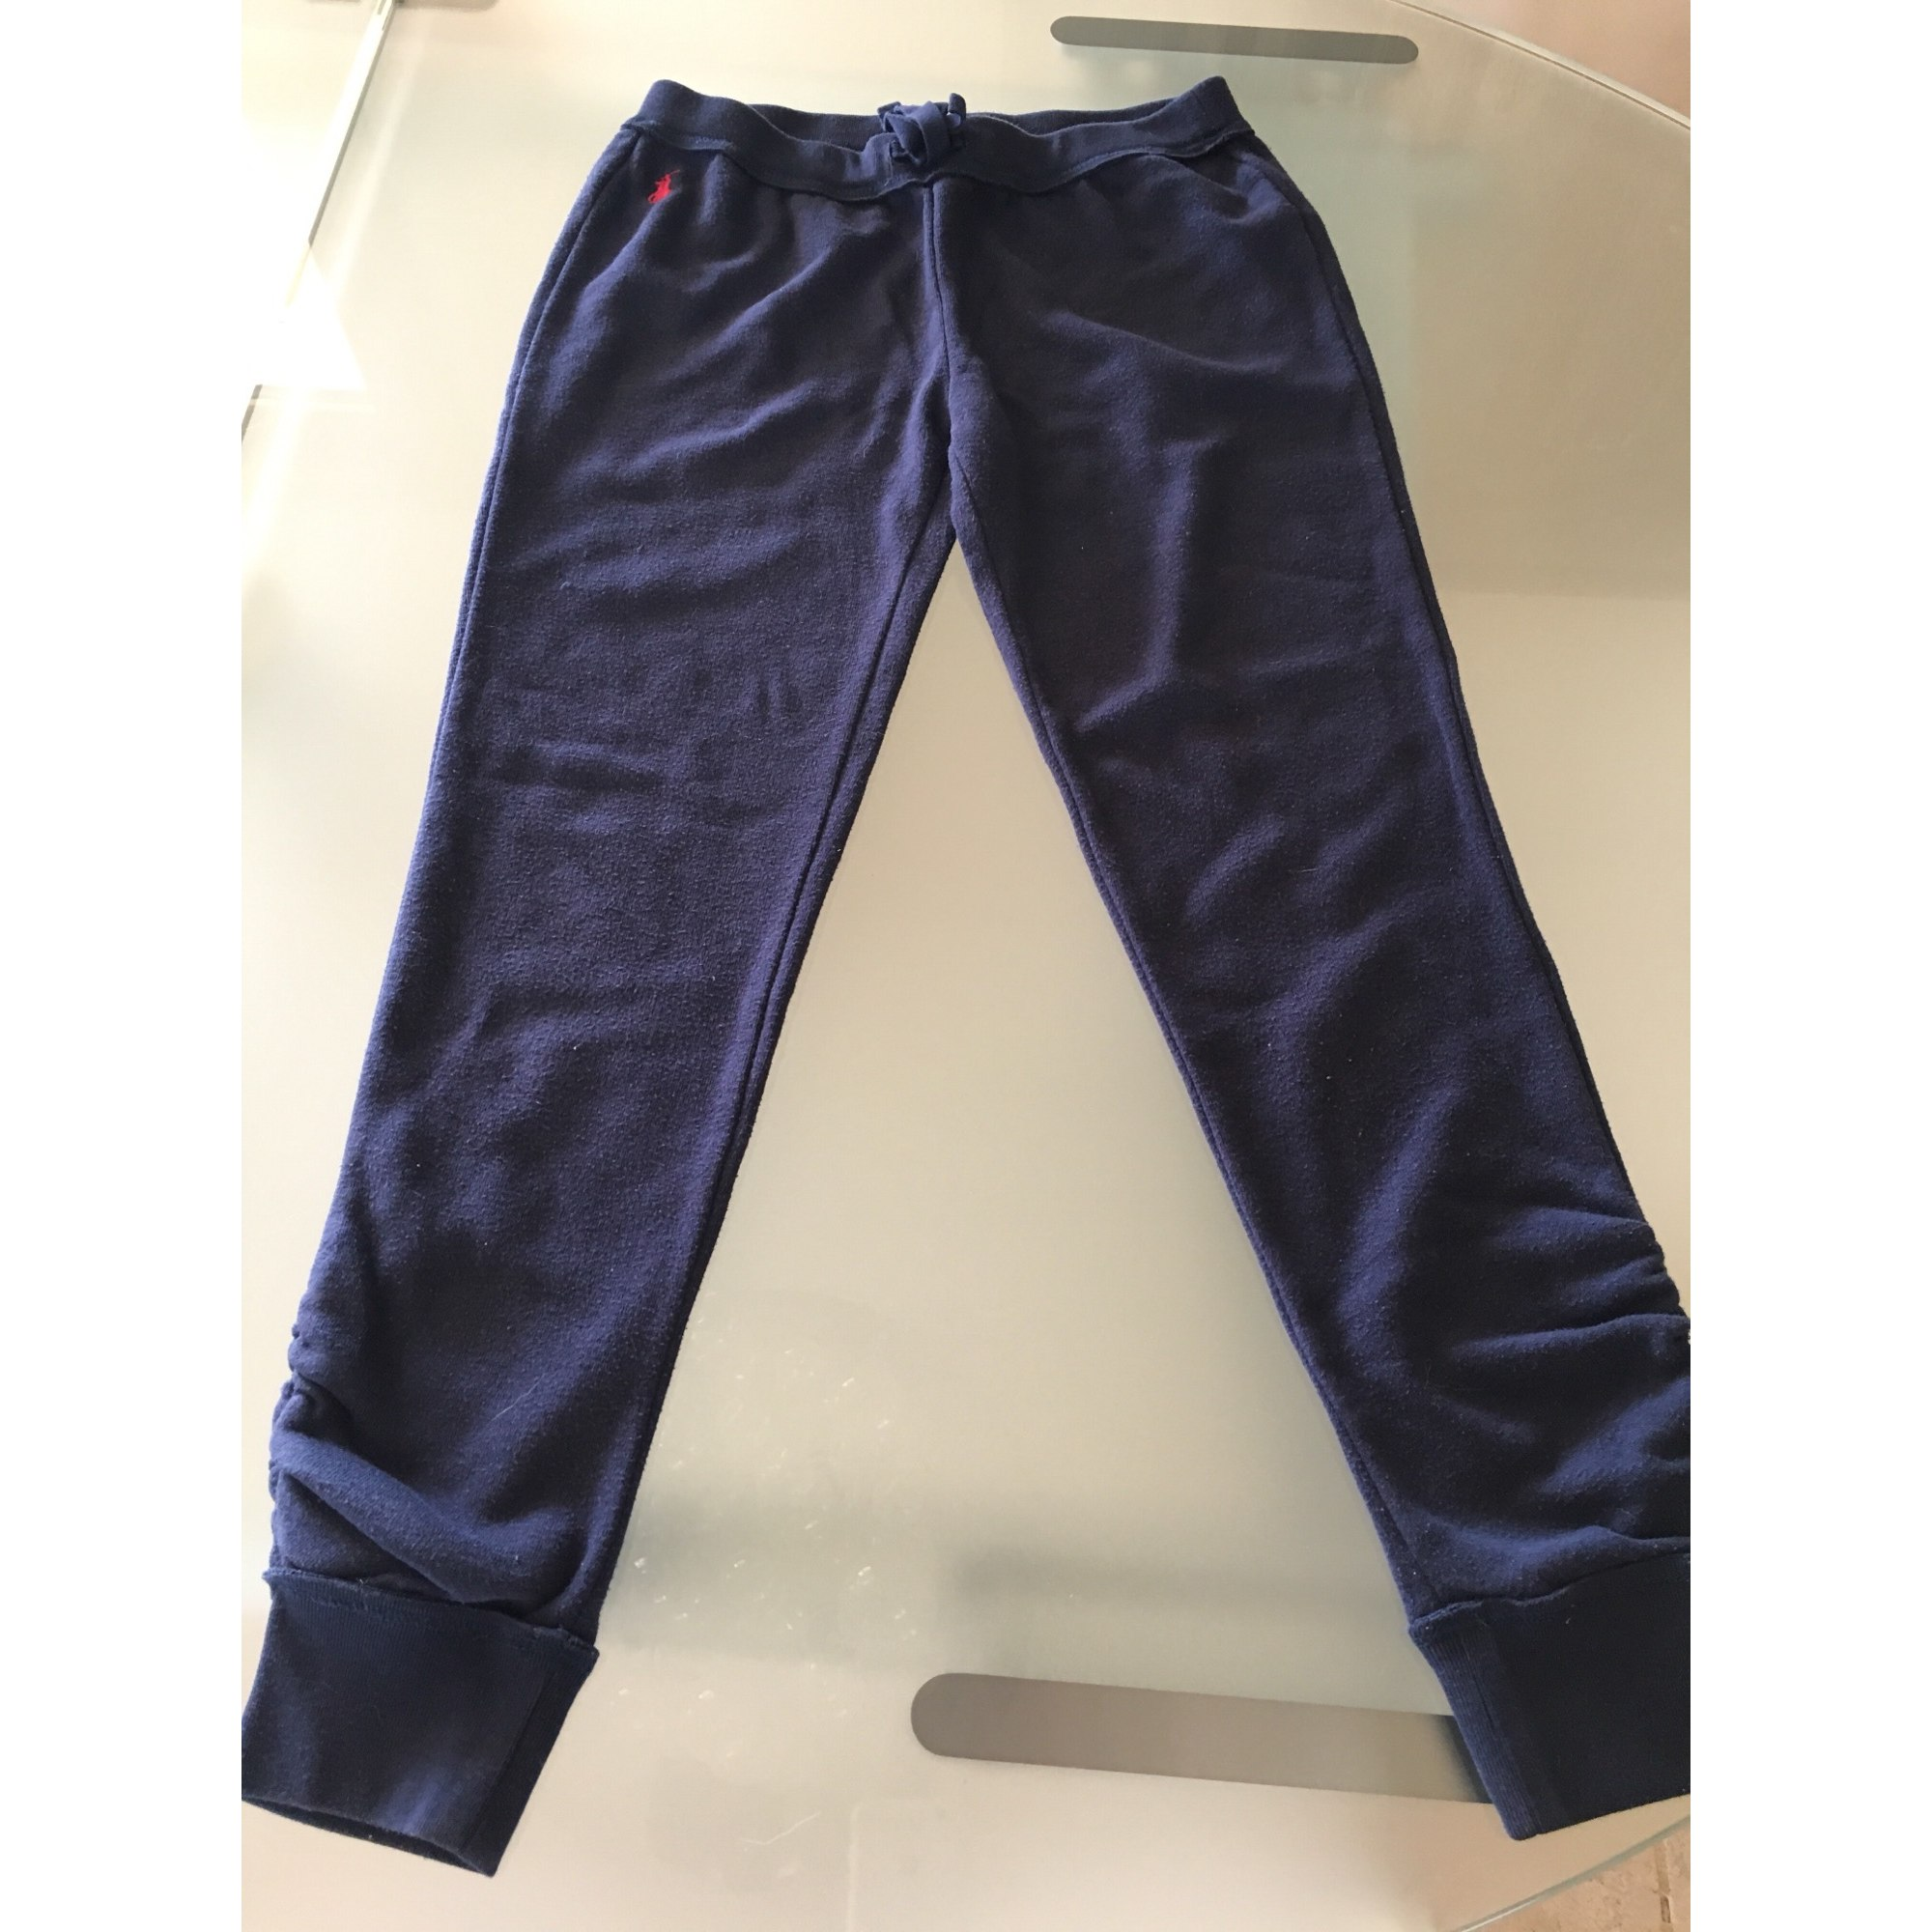 d2f561973f4 Pantalon de survêtement RALPH LAUREN 11-12 ans bleu - 8020035